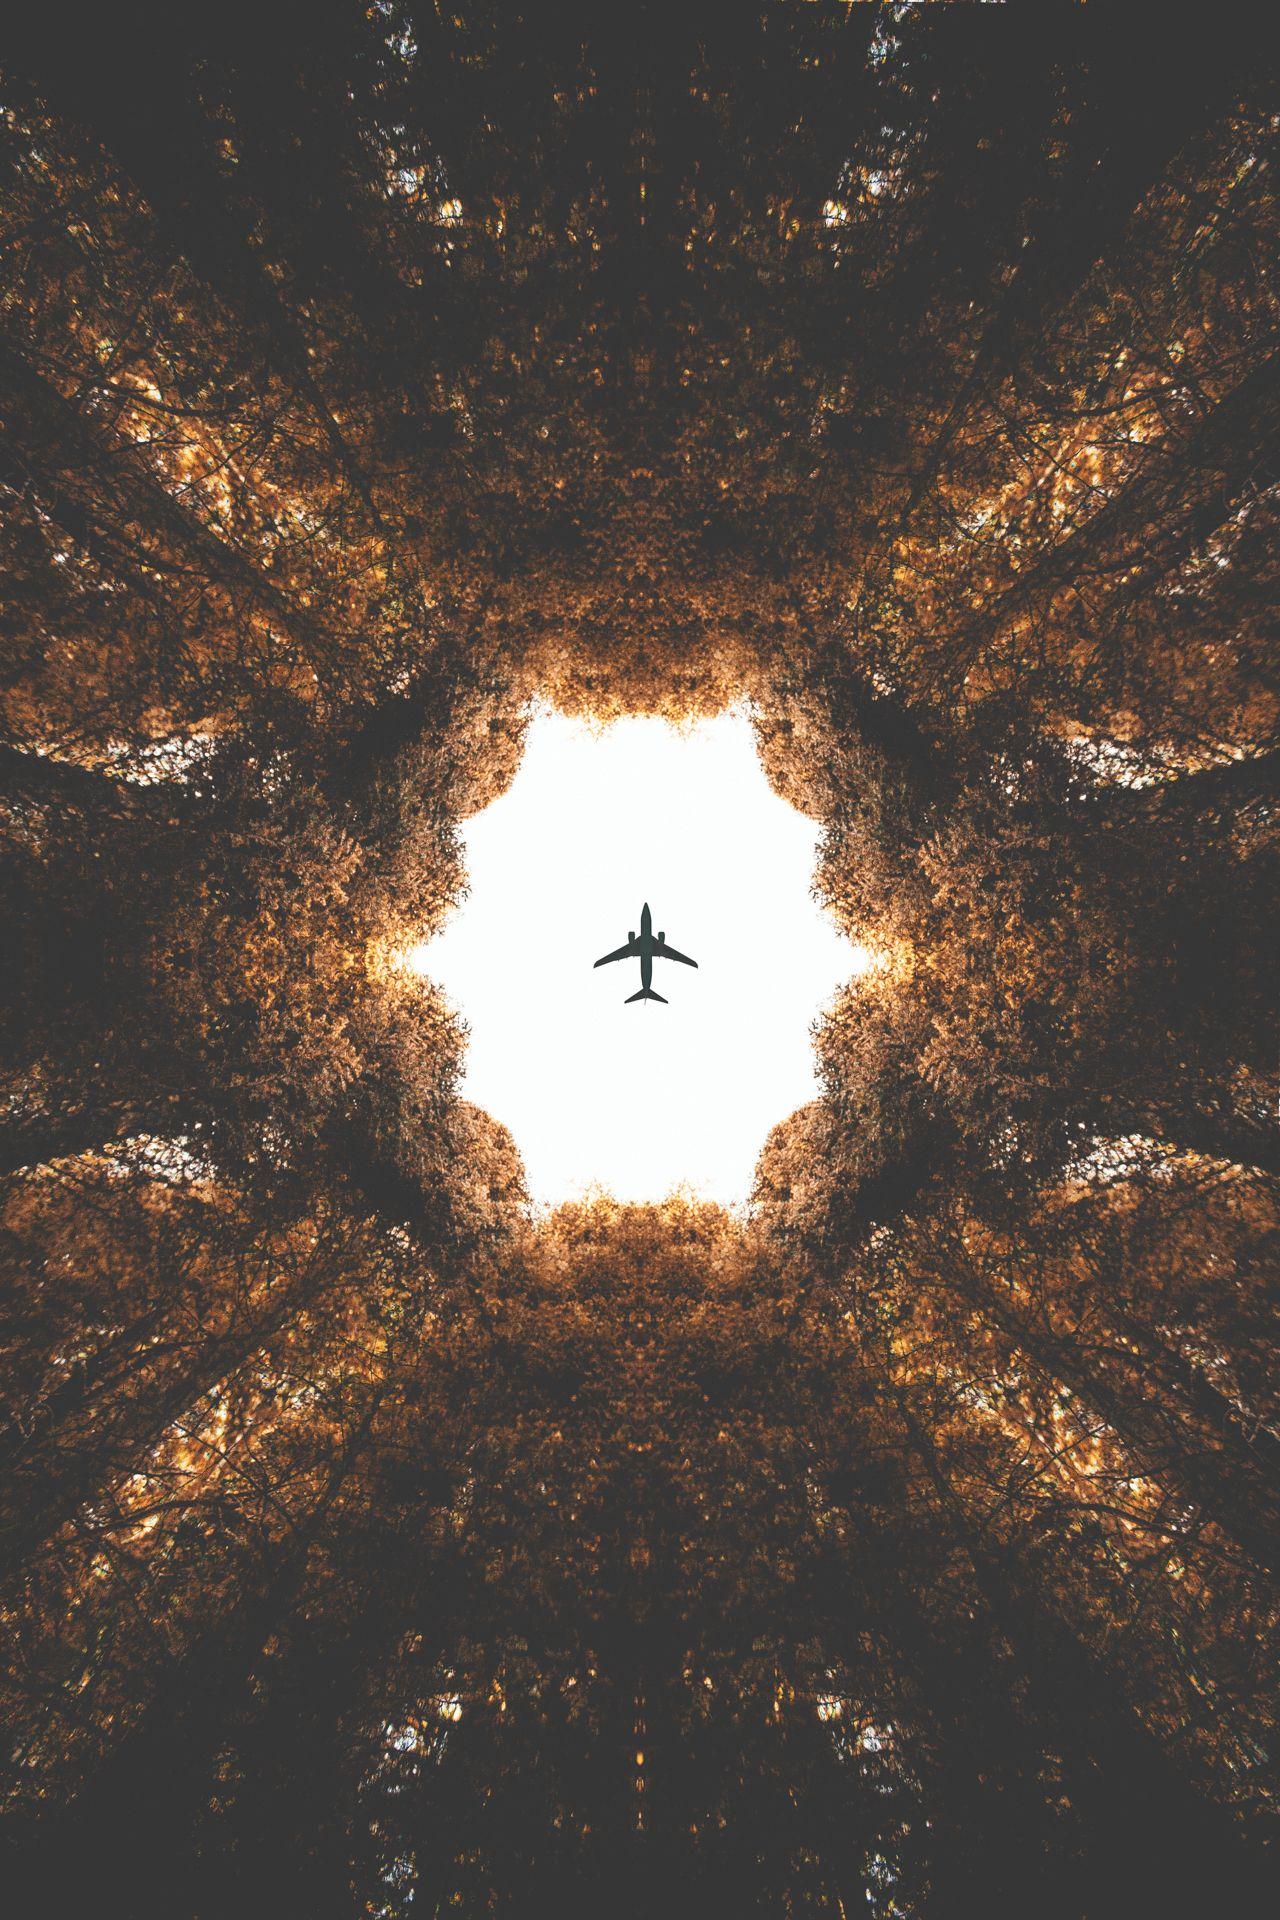 Iphone wallpaper tumblr travel - Photos